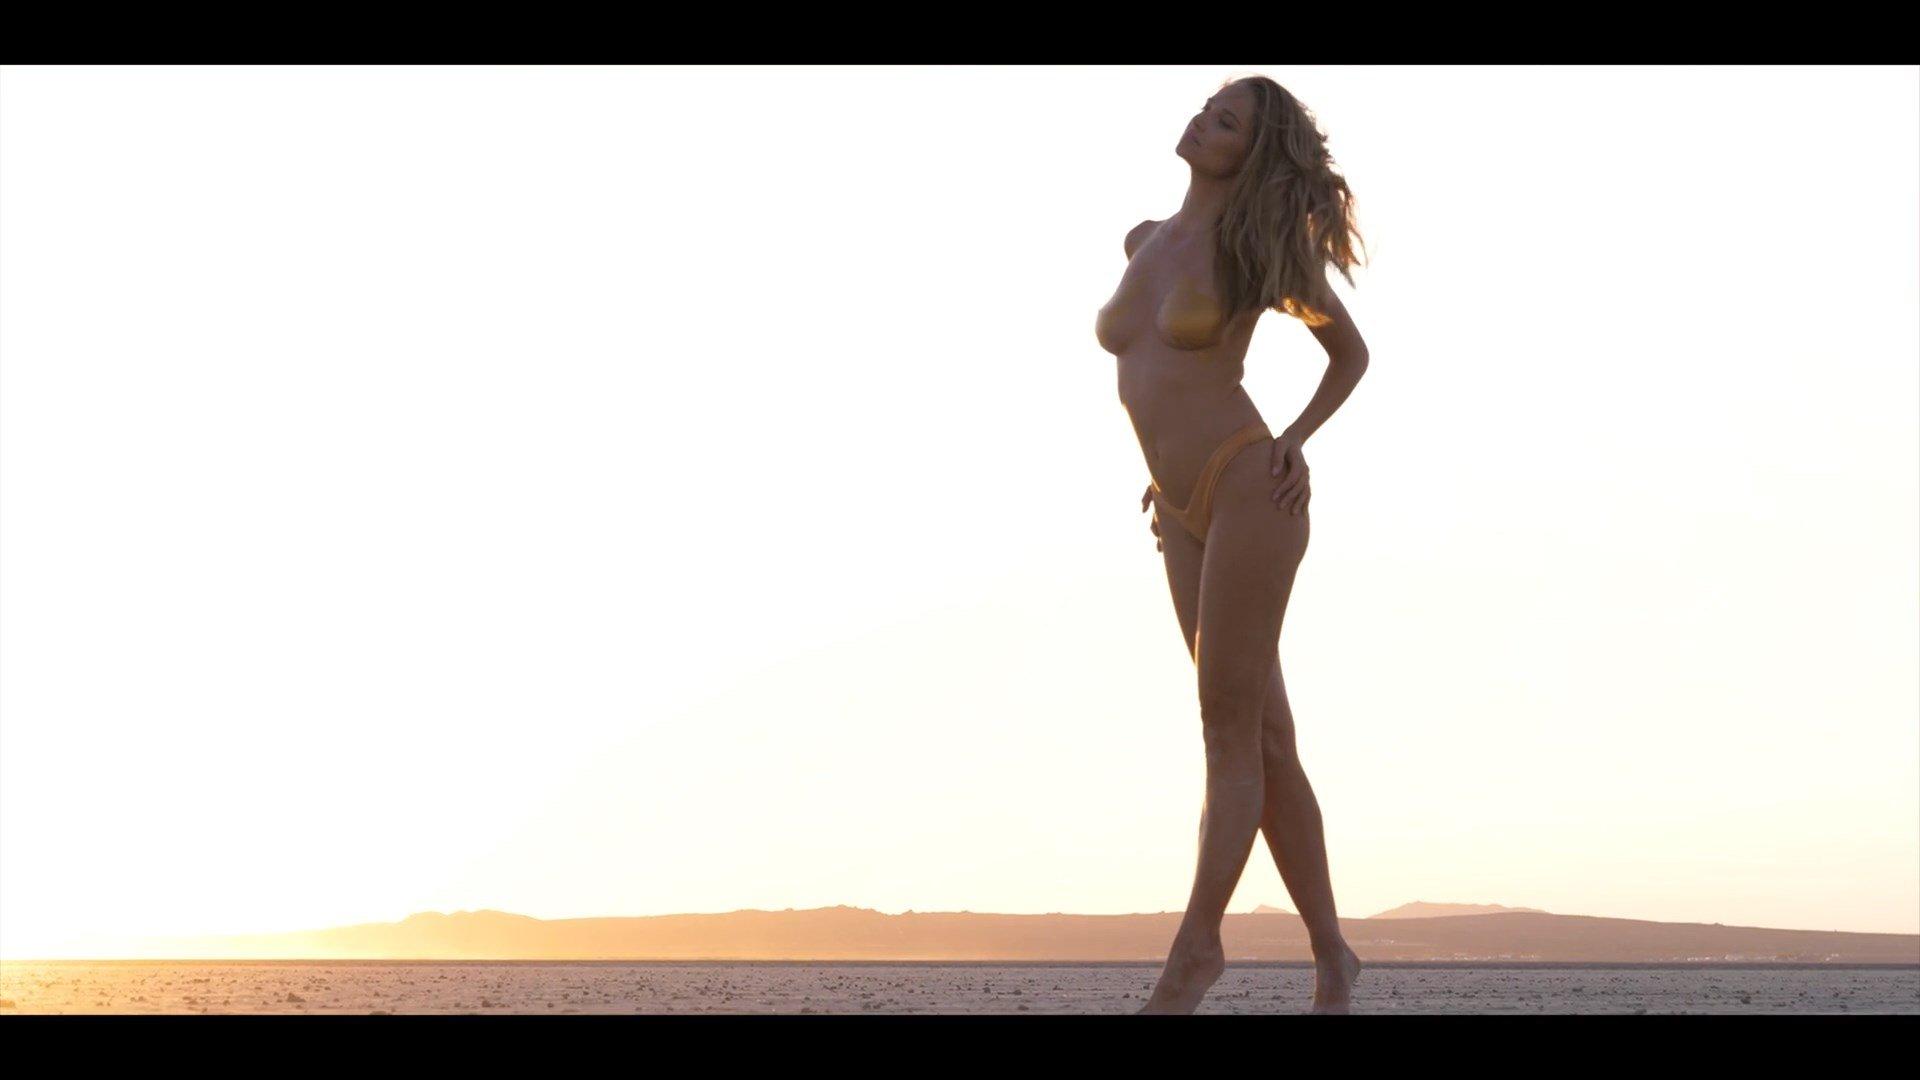 Maggie gyllenhaal the deuce s01e05 masturbate - 3 5